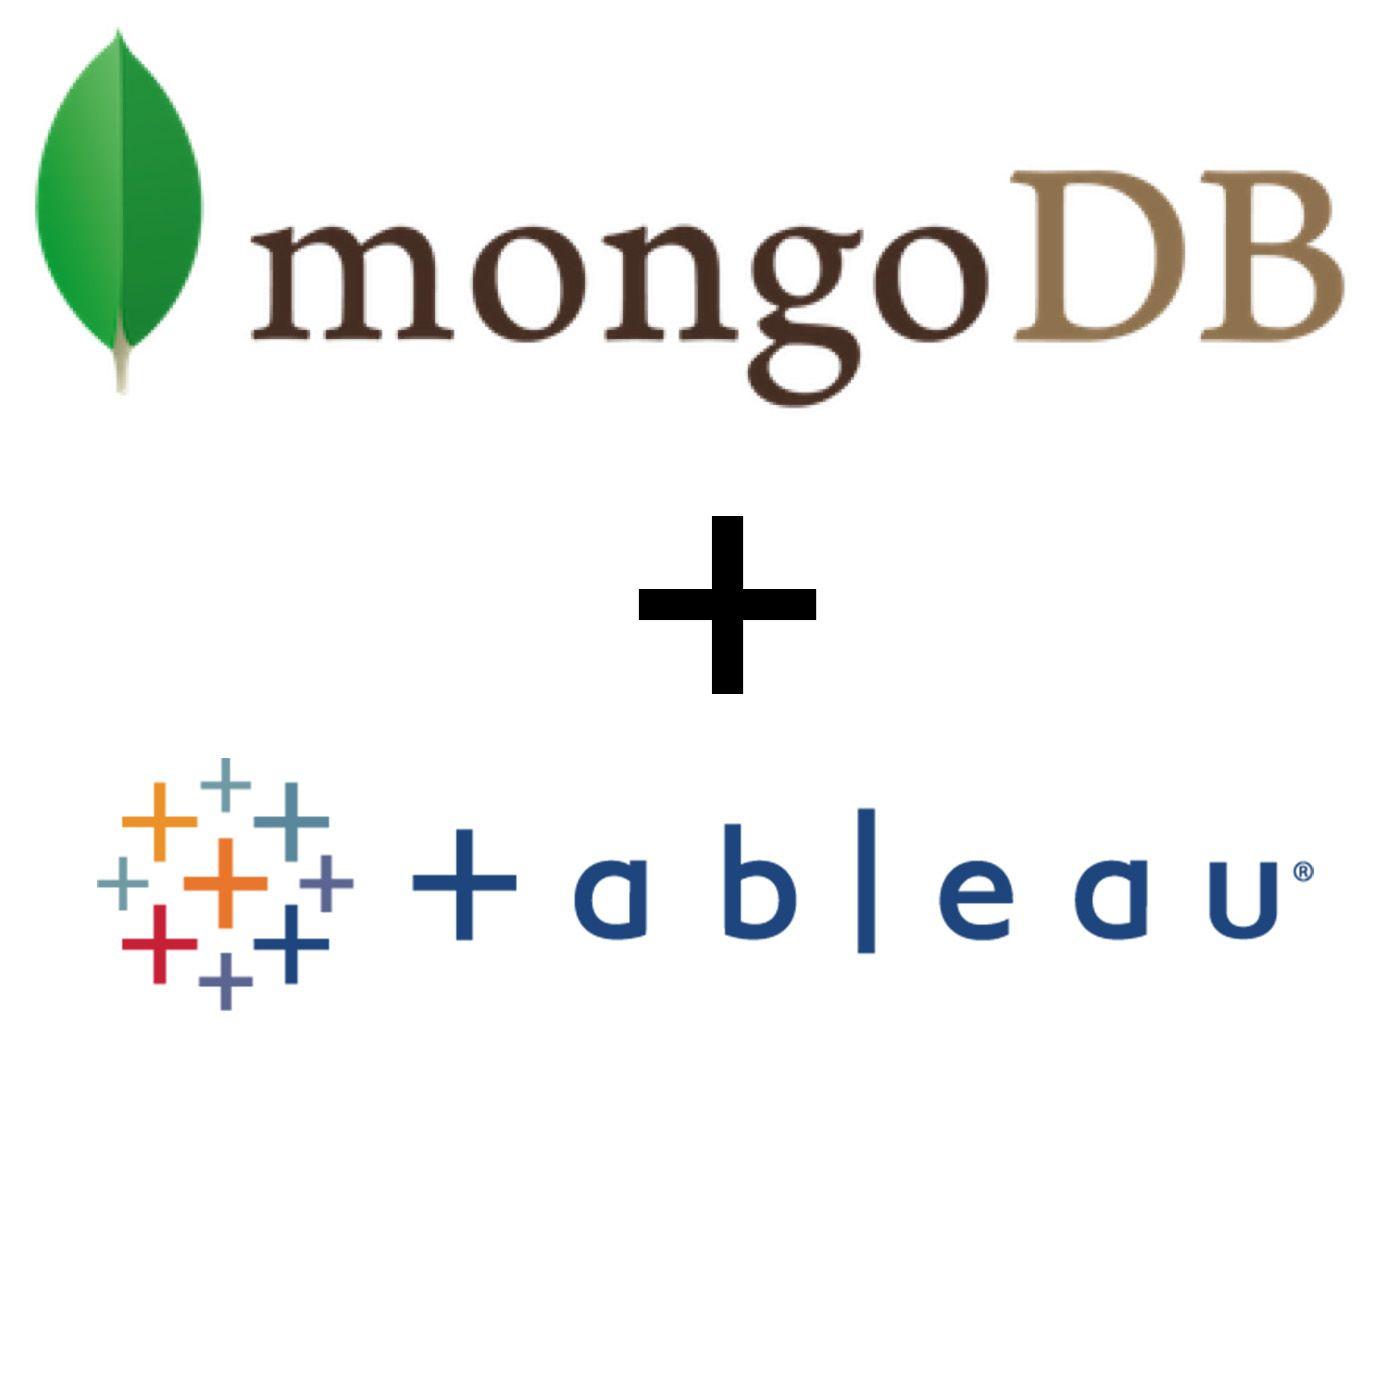 tableau mongodb integration